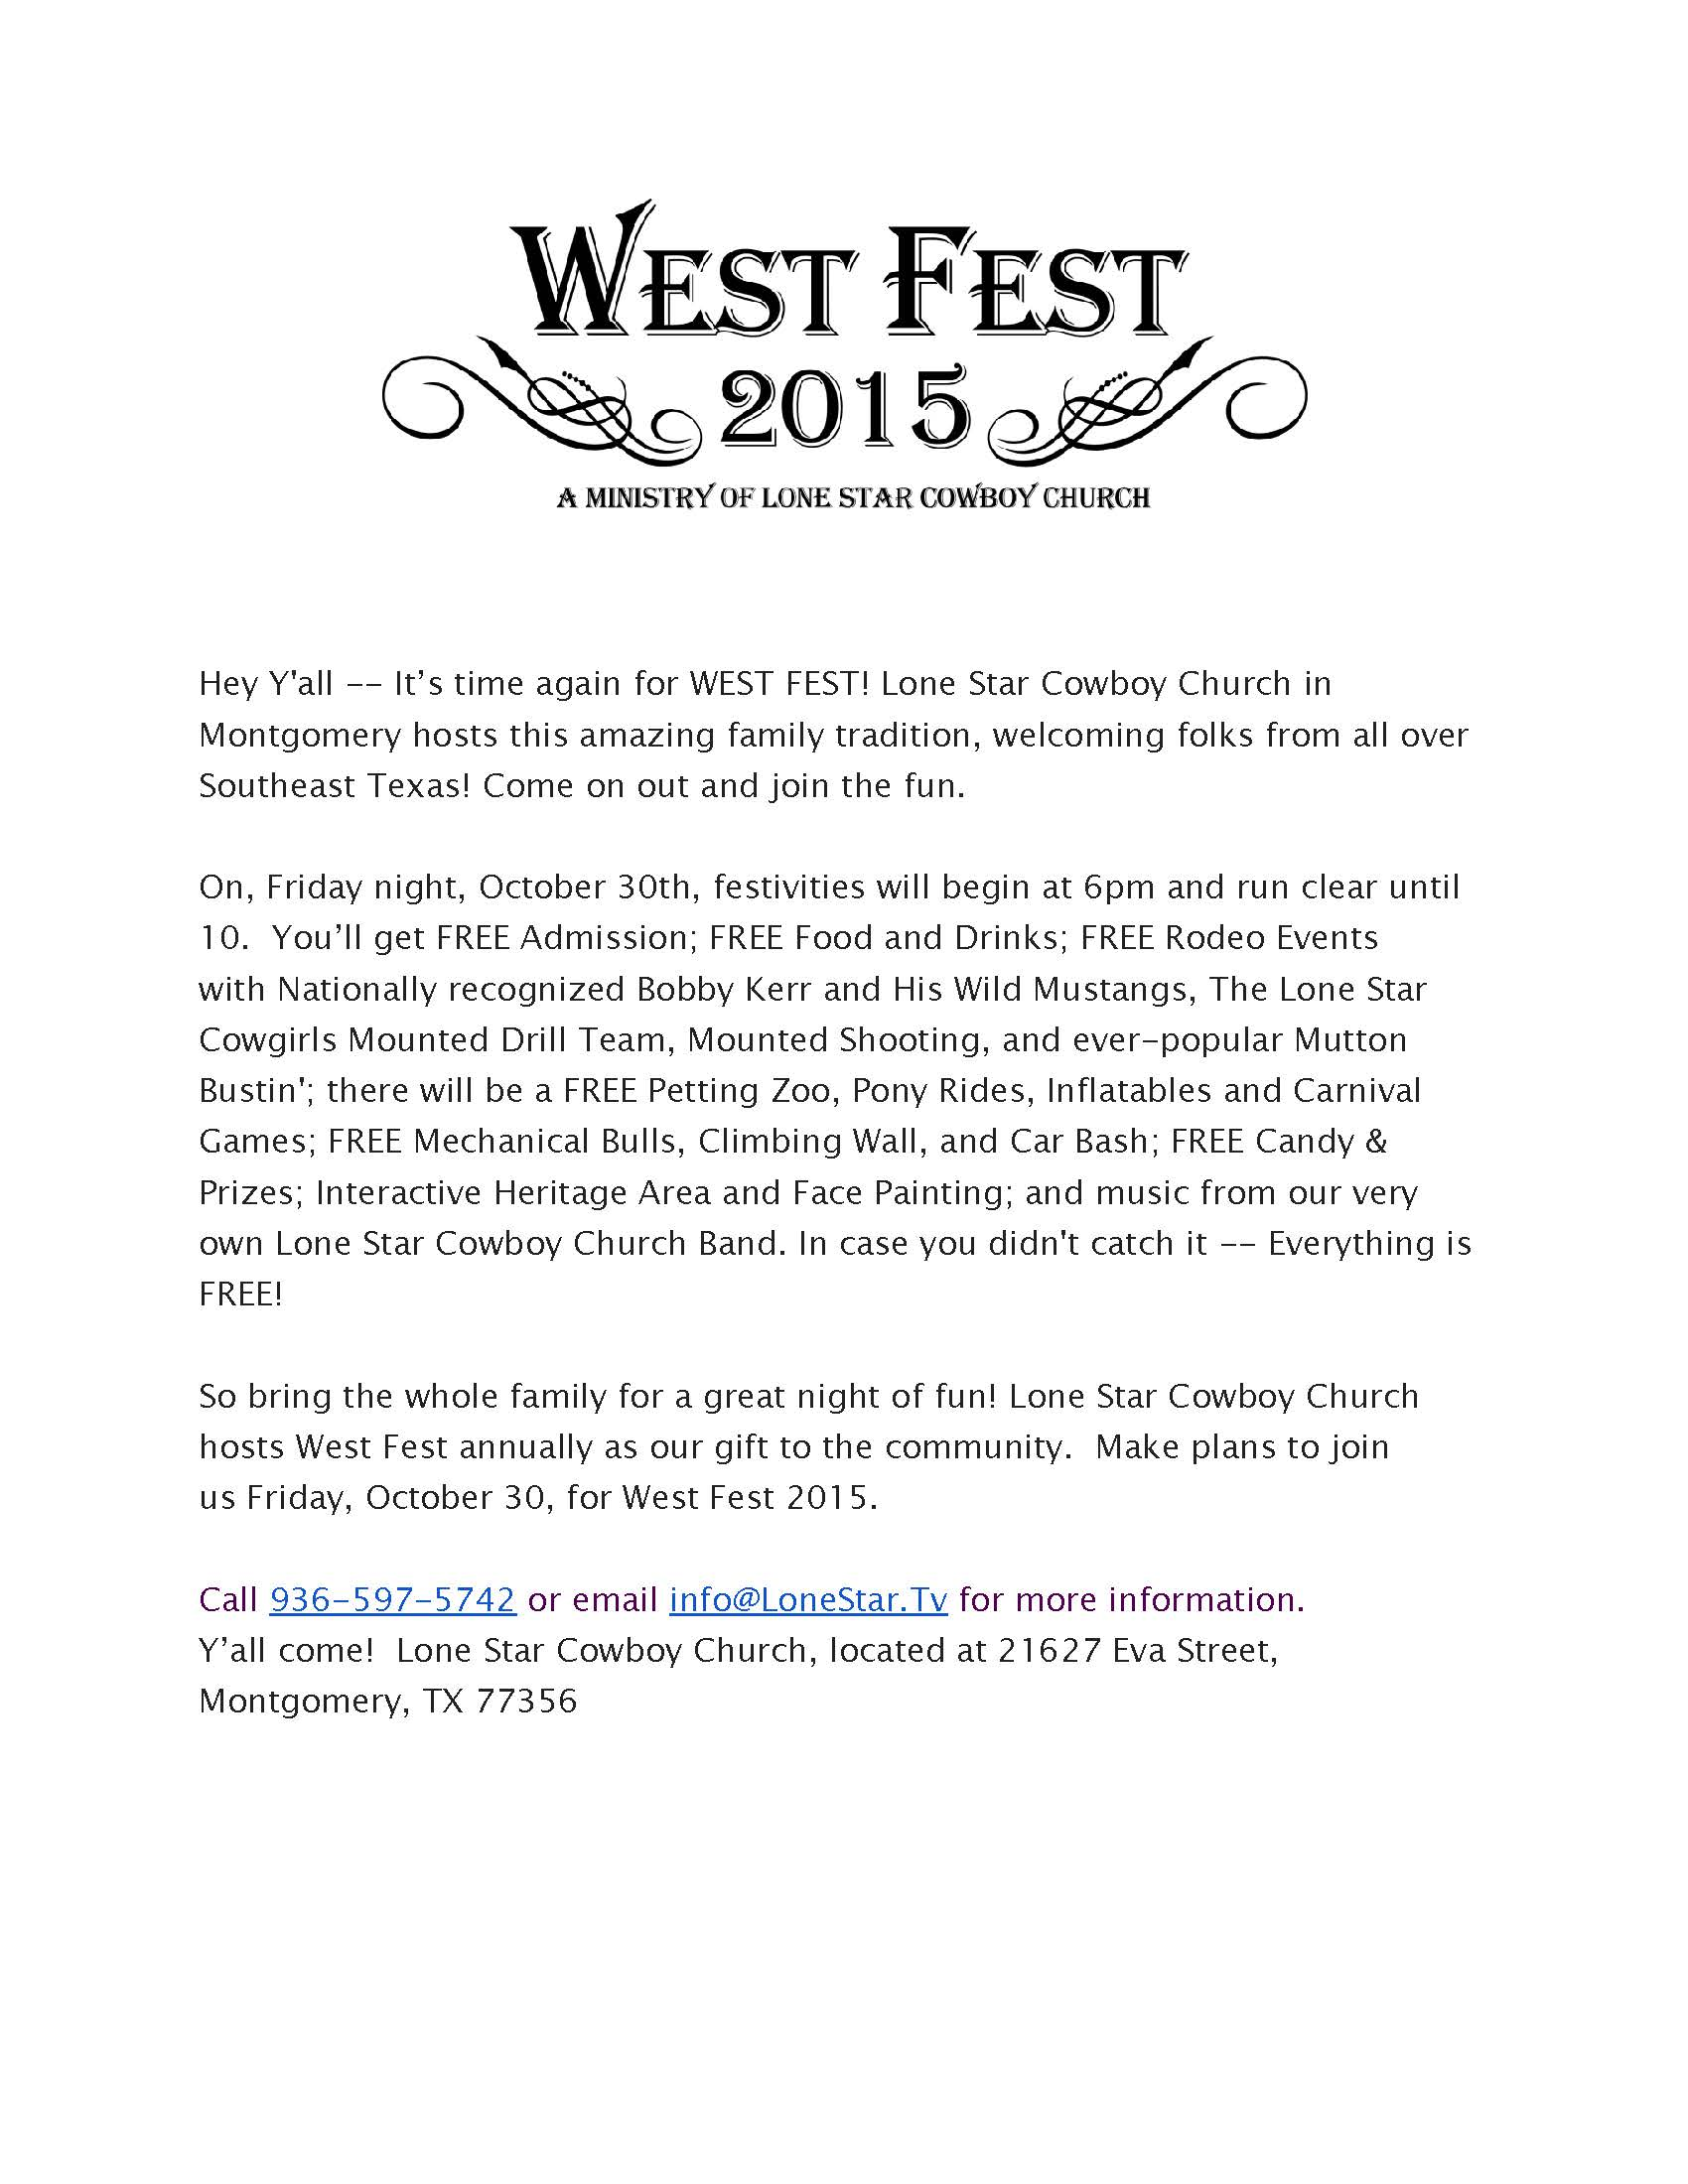 West Fest Press Flyer